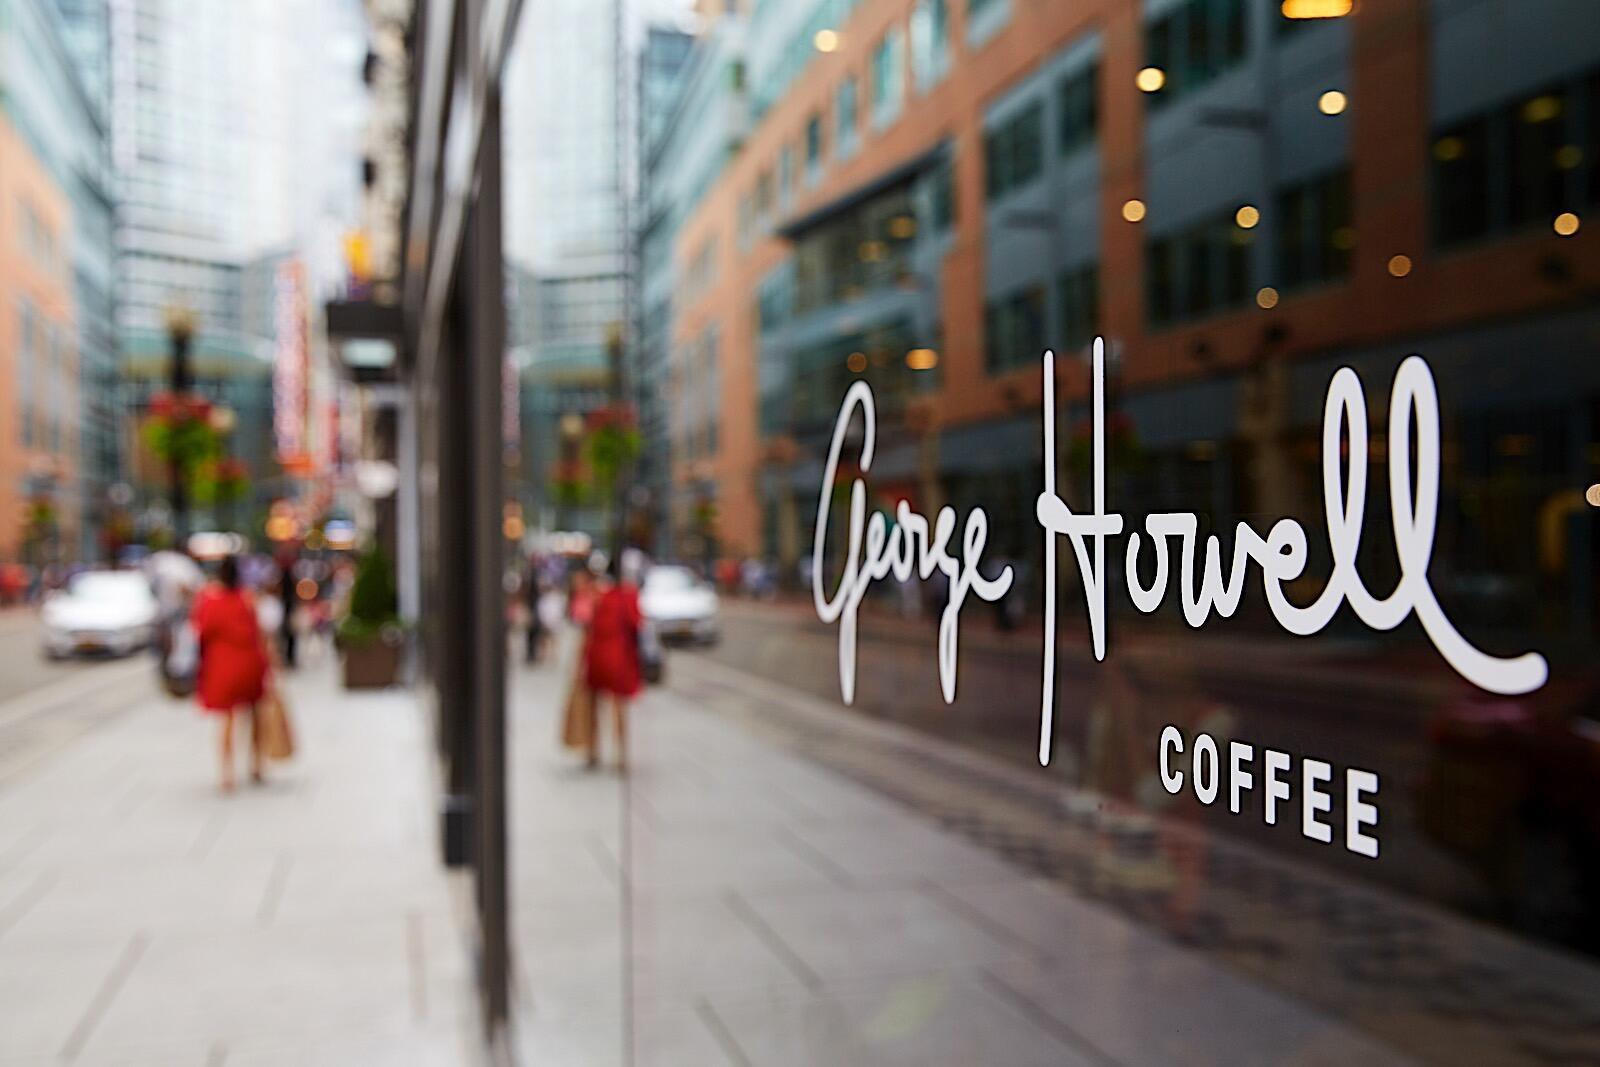 George Howell Coffee Logo on Glass Door